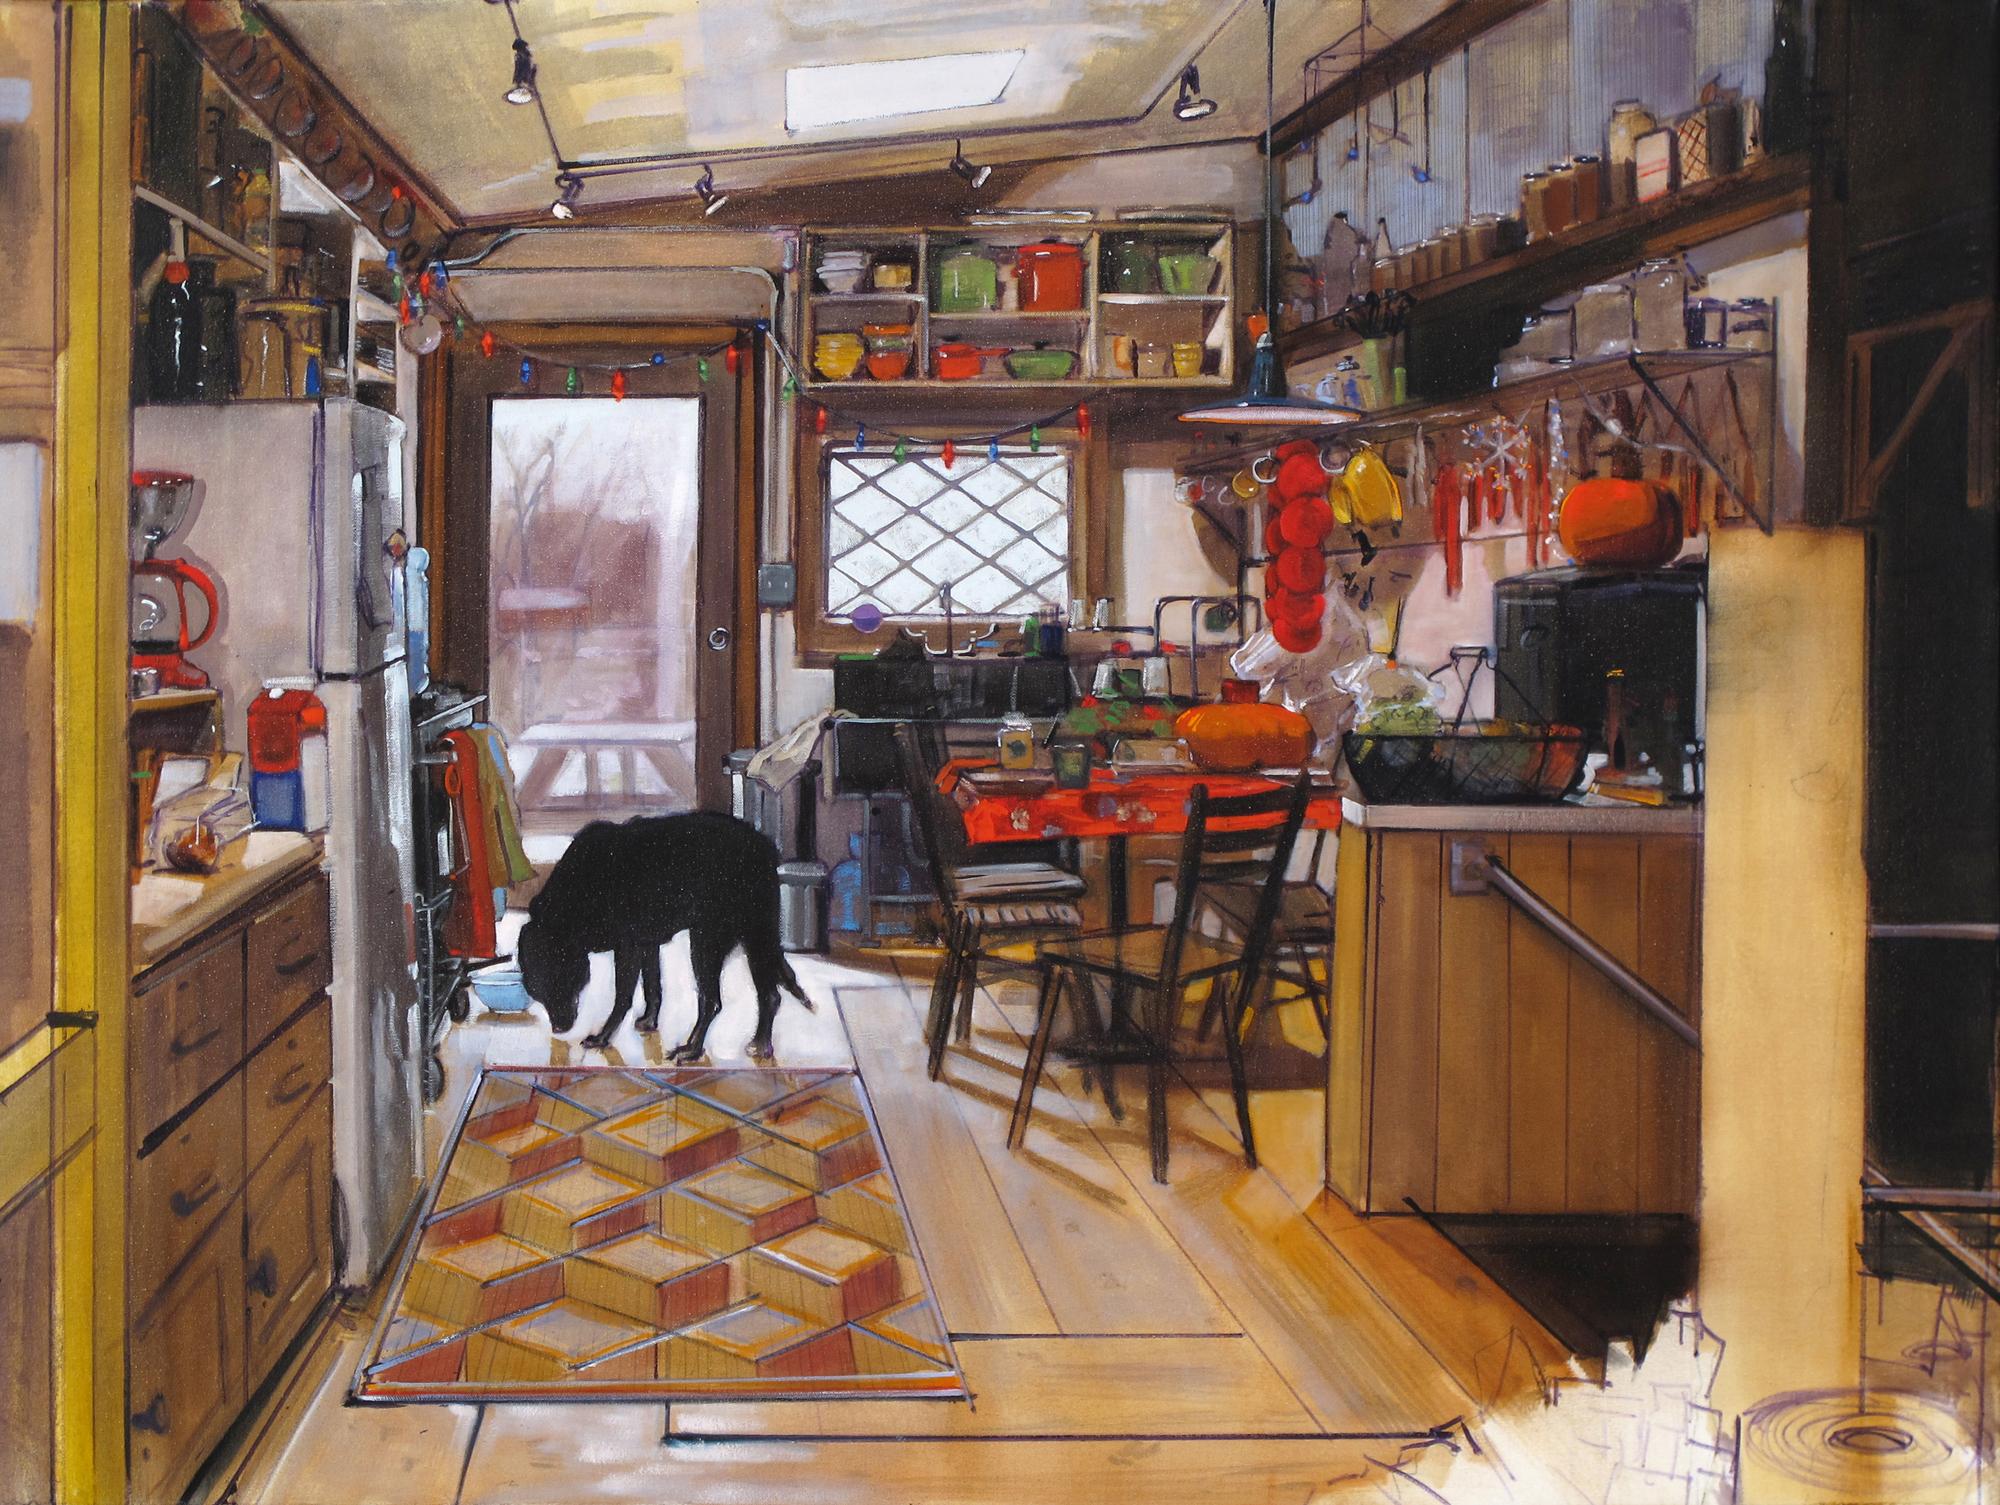 Kitchen Creativity: Judy Pfaff